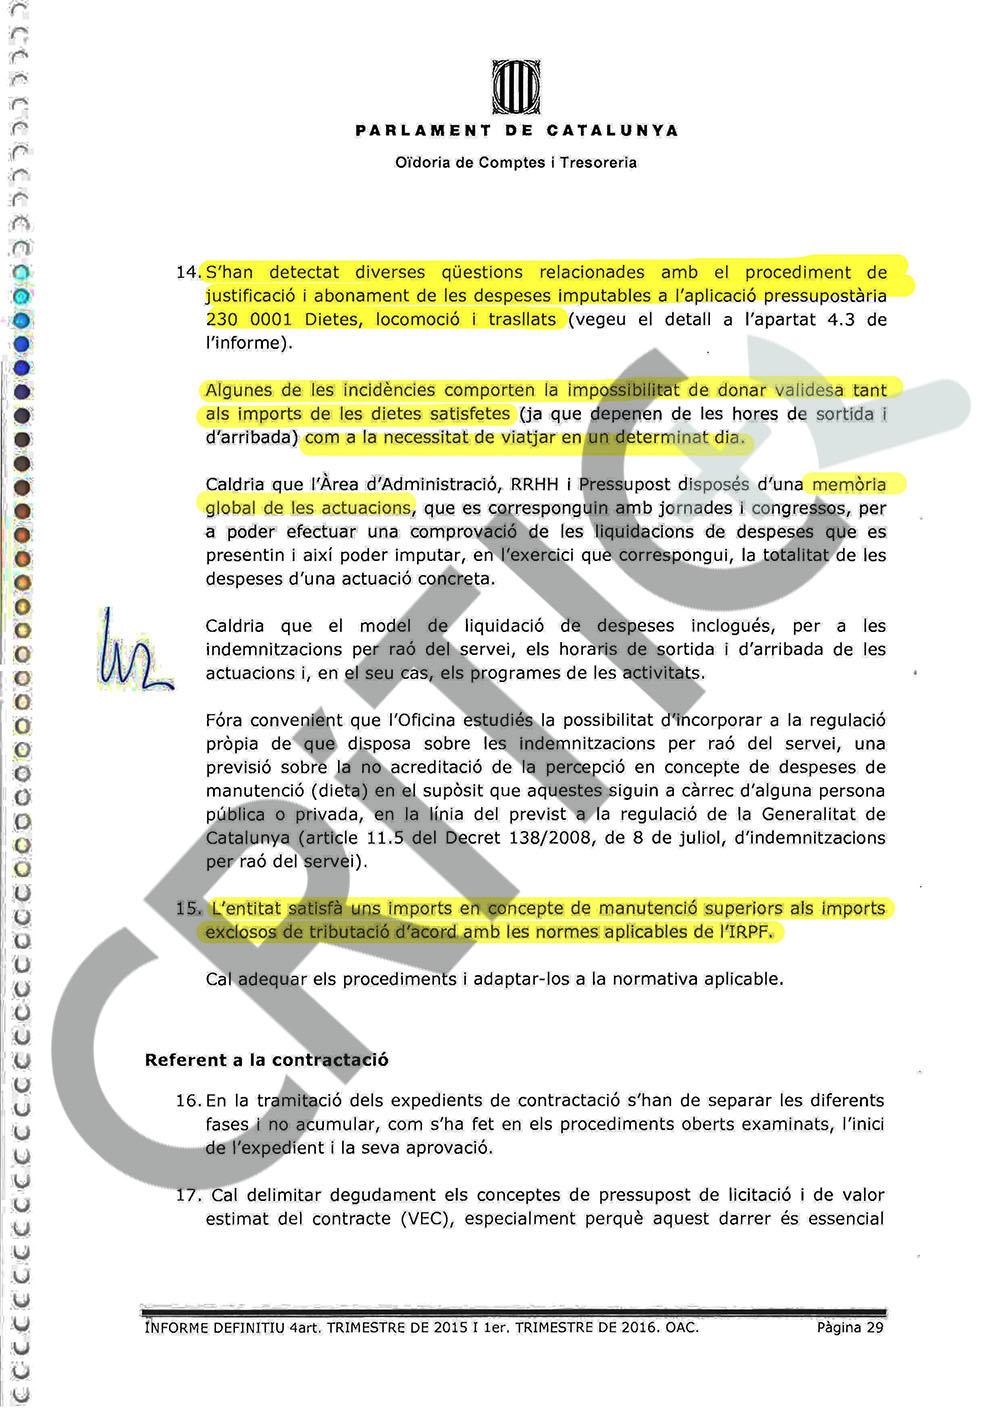 incidencies_dietes_2 copy